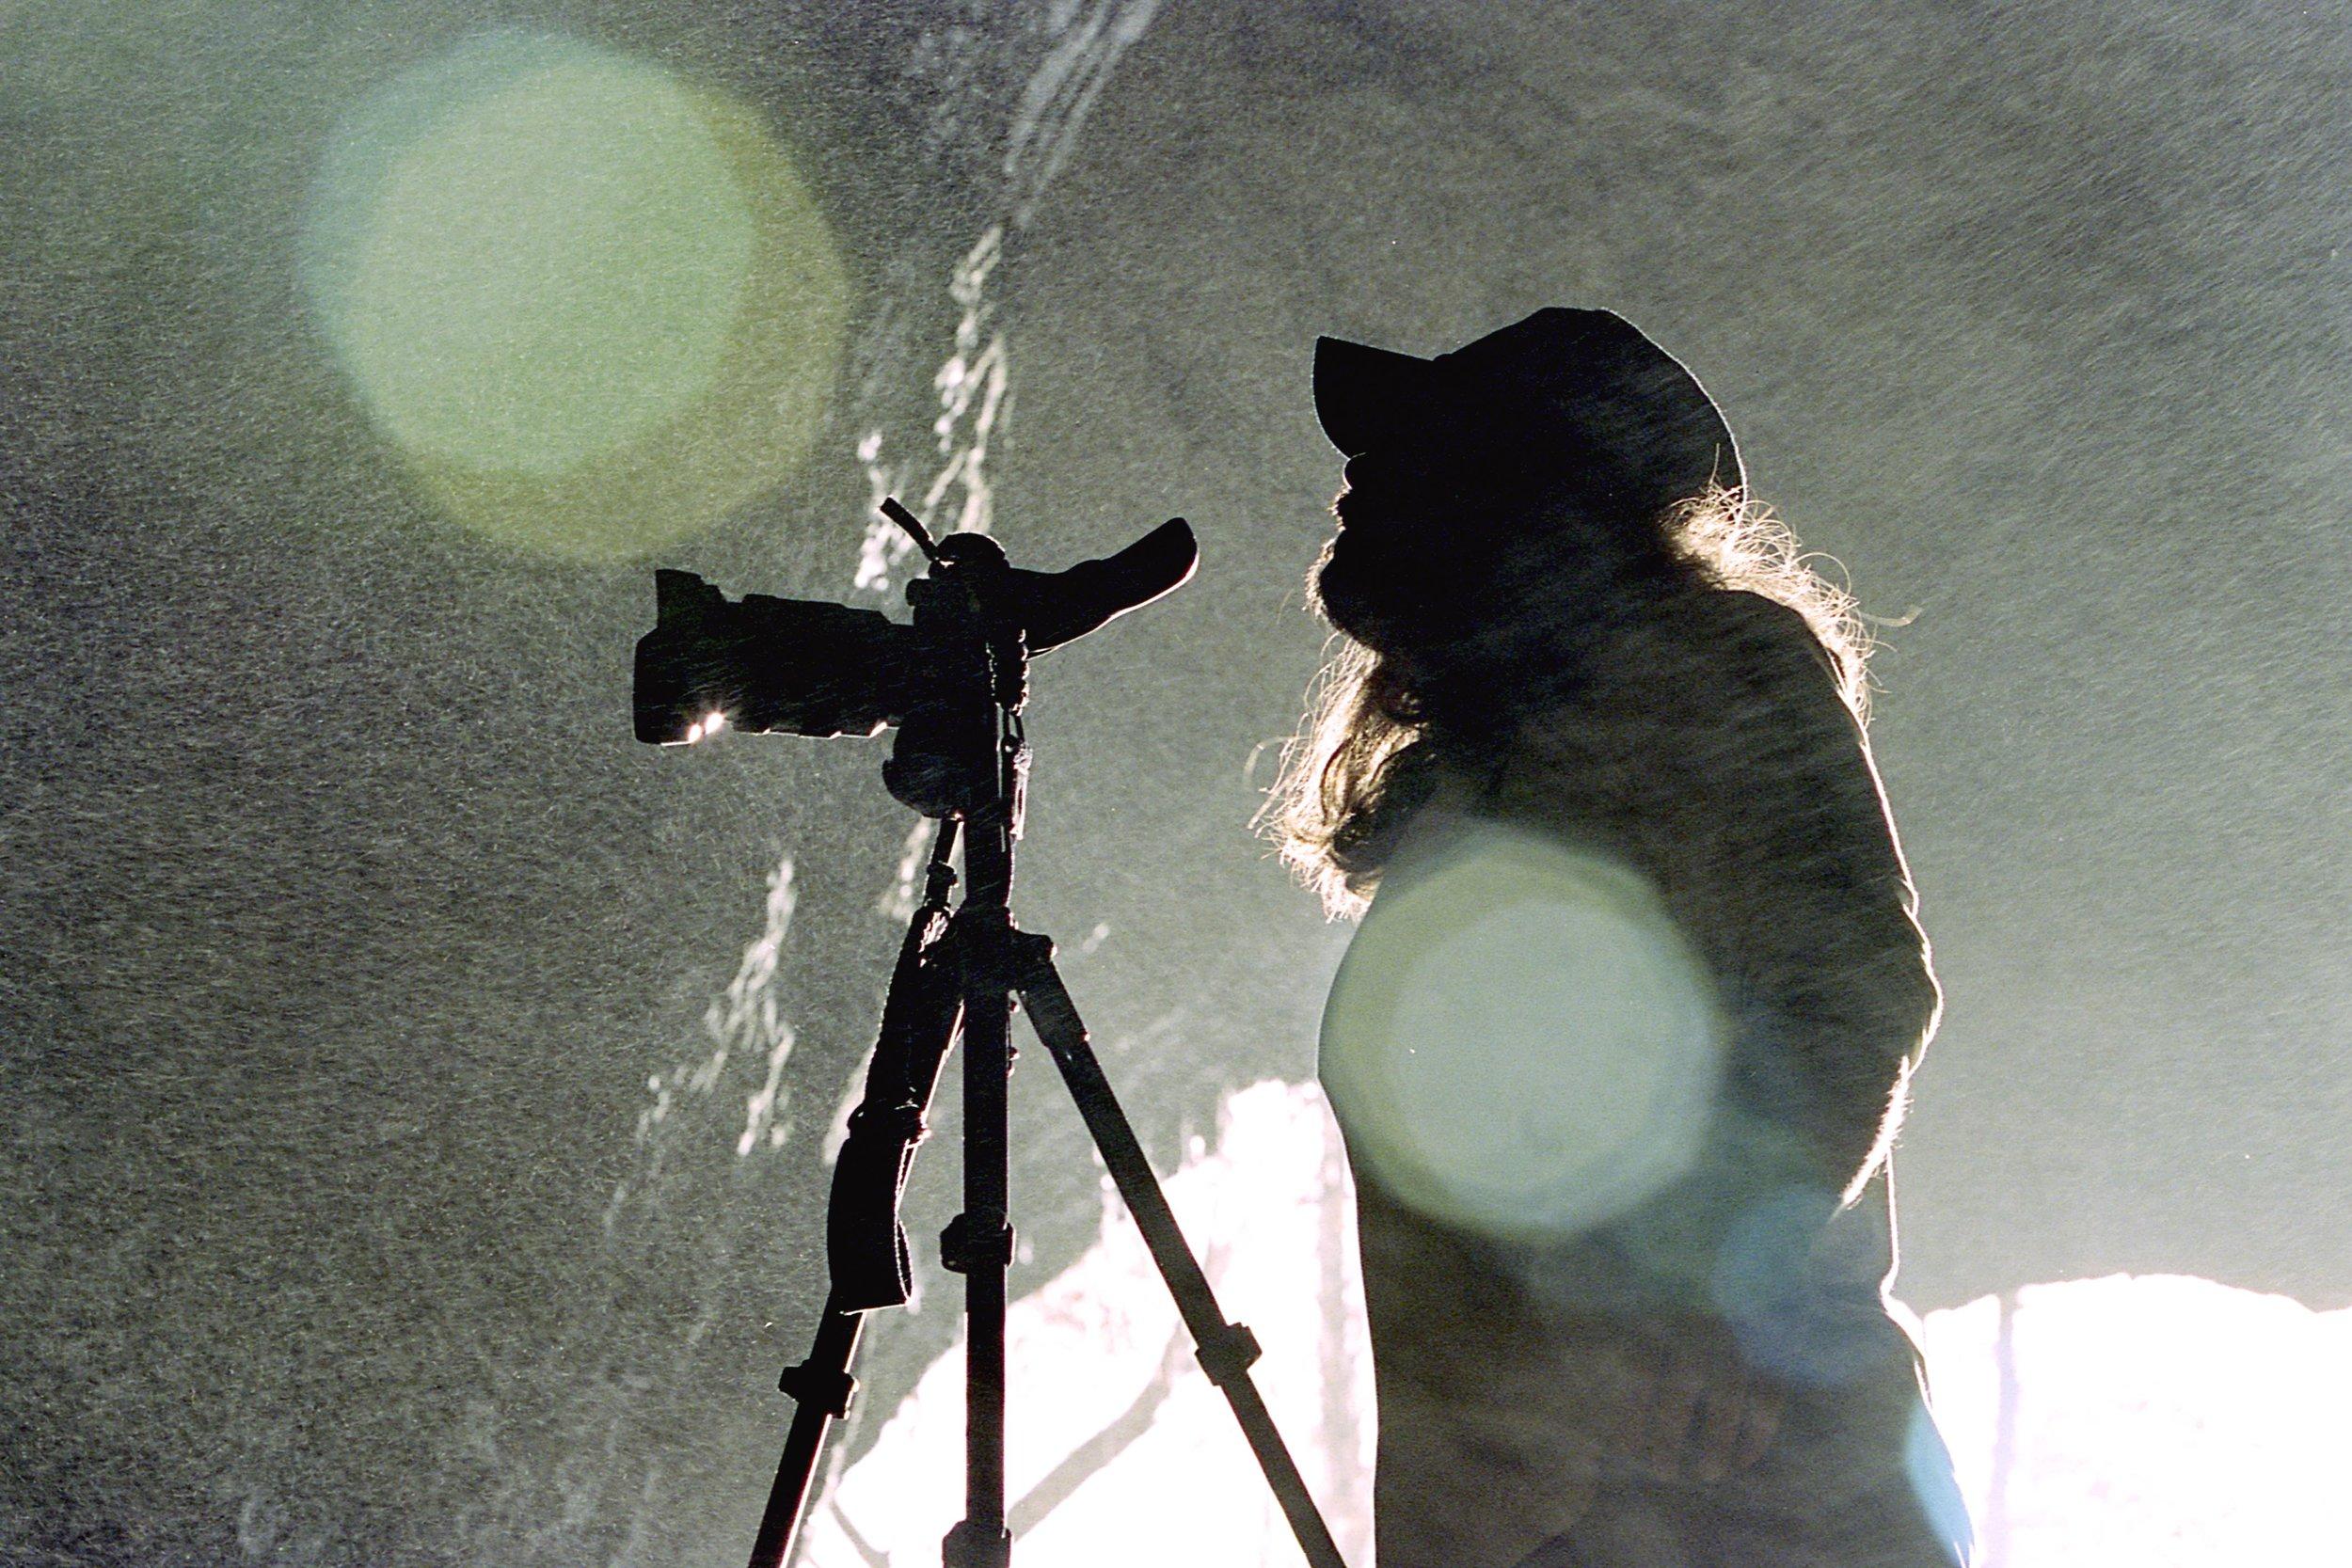 Matt Pittman / Jeff Rose / Stephens Gap Cave / Kodak Portra 400